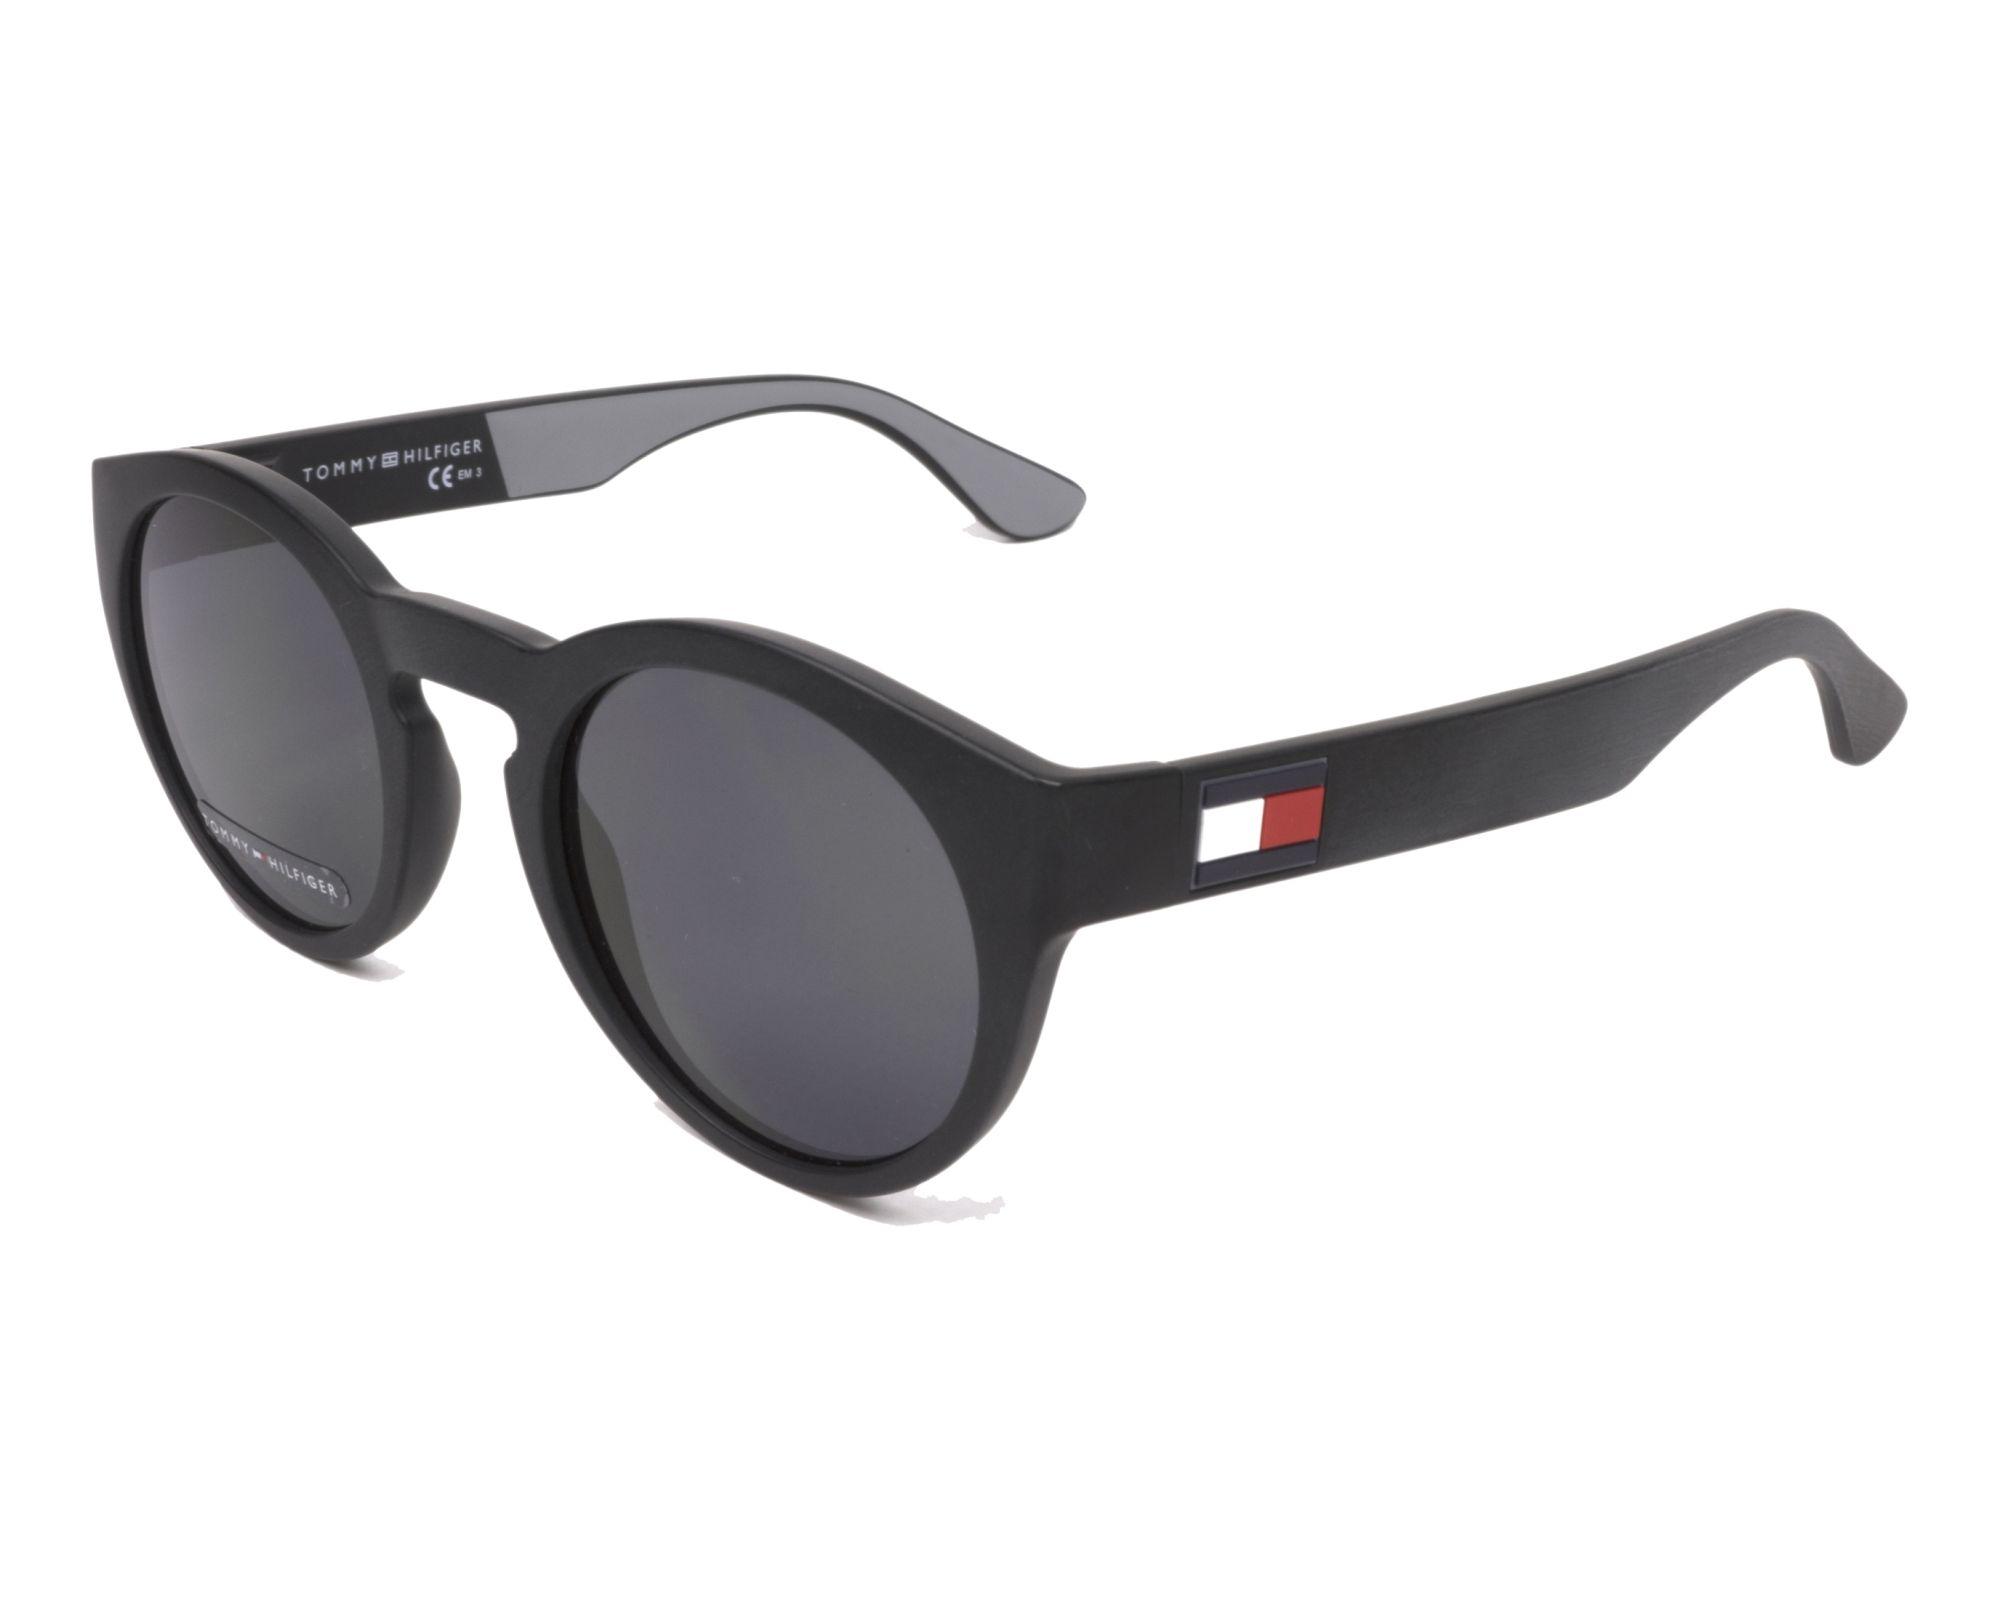 Tommy Hilfiger TH1555/S 08A Sonnenbrille q4daOv4j